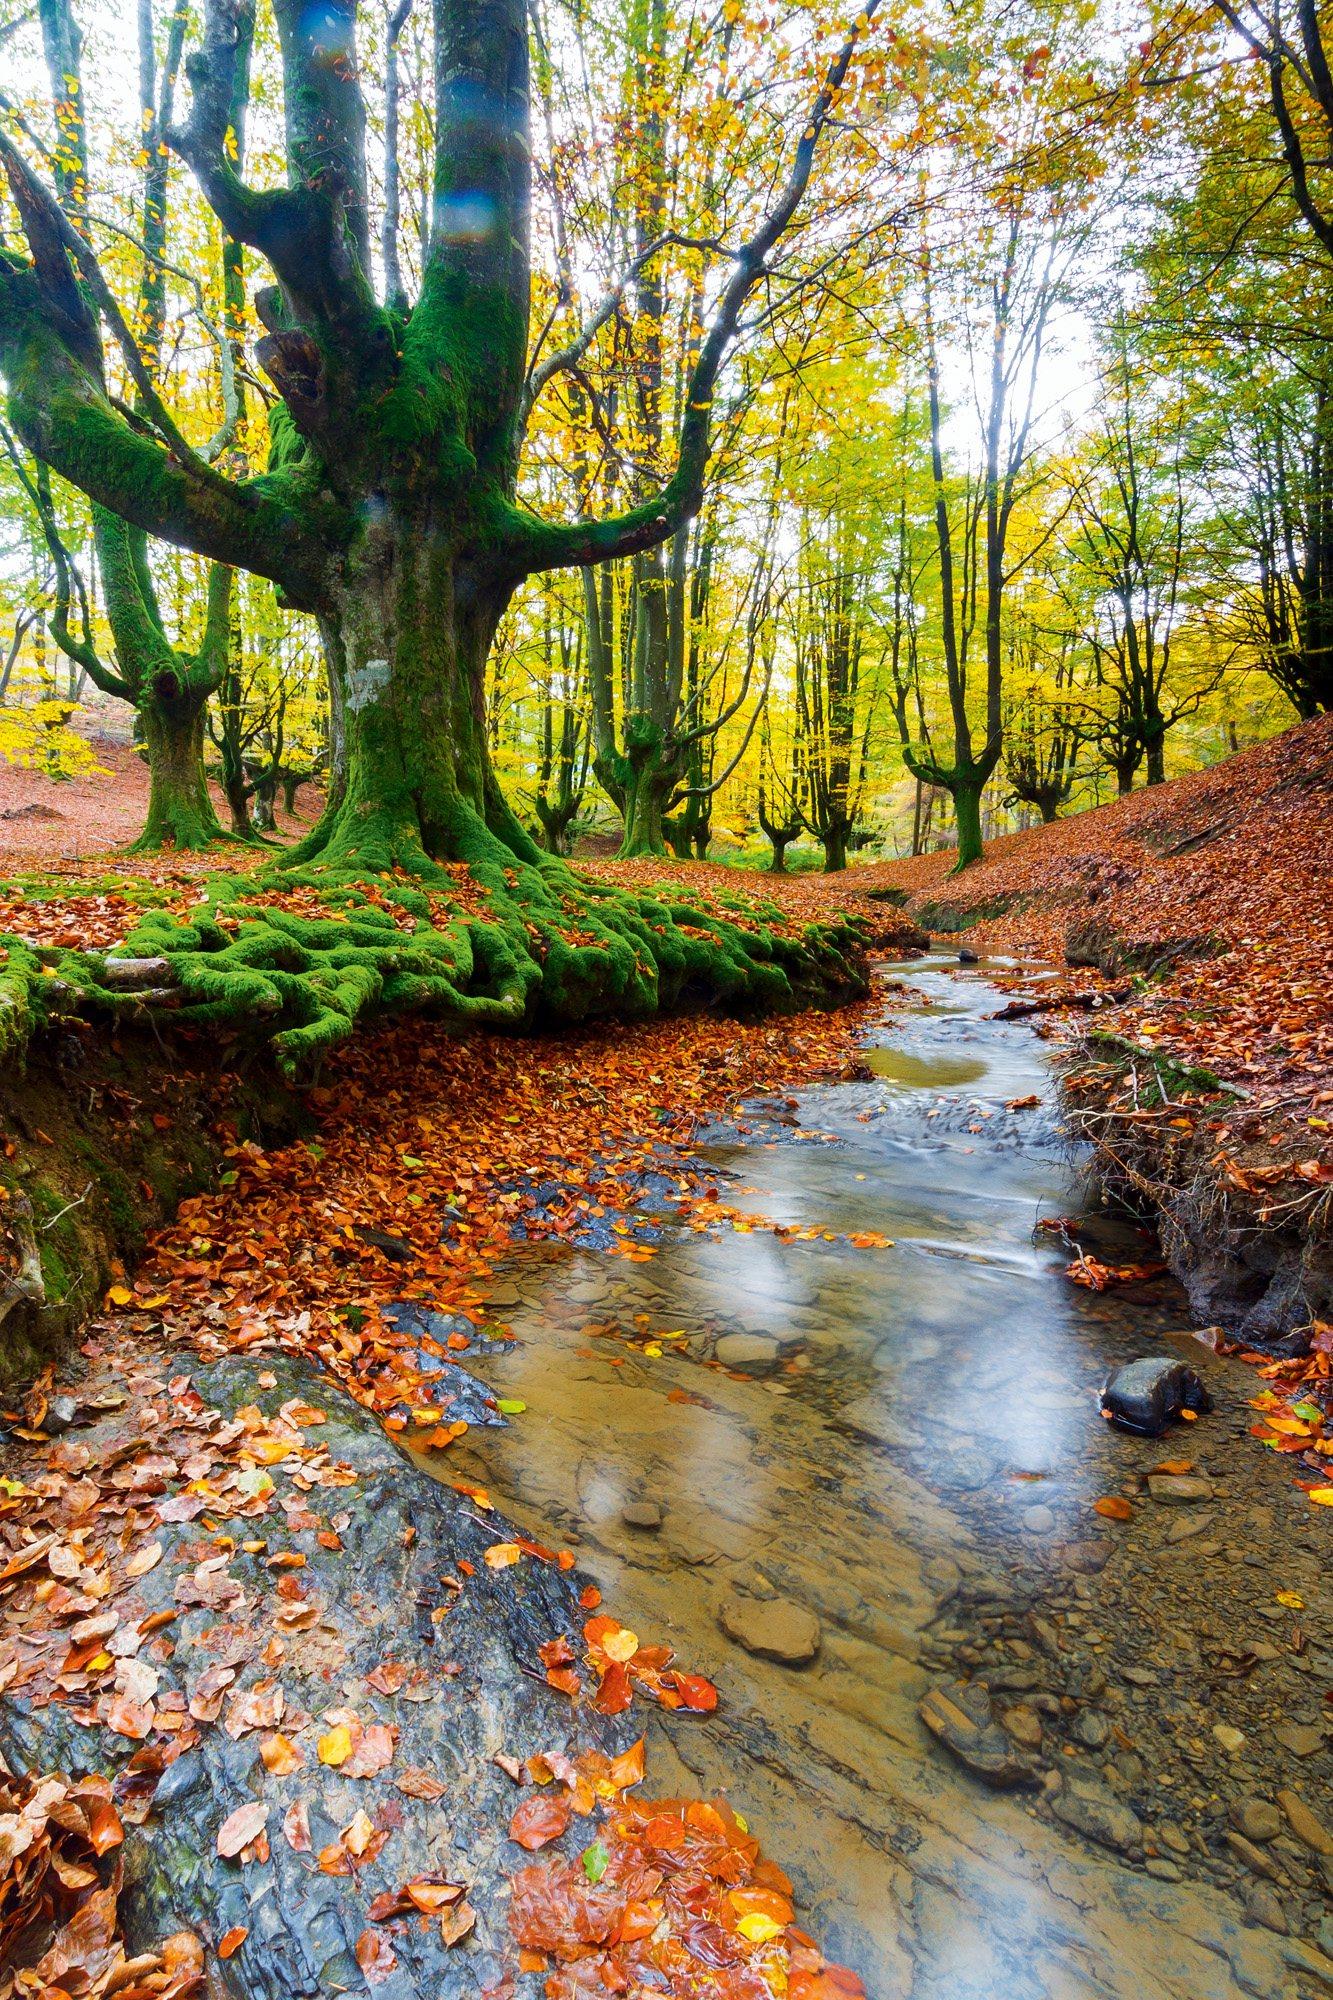 Parque Natural de Gorbea, País Vasco, España / National Geographic